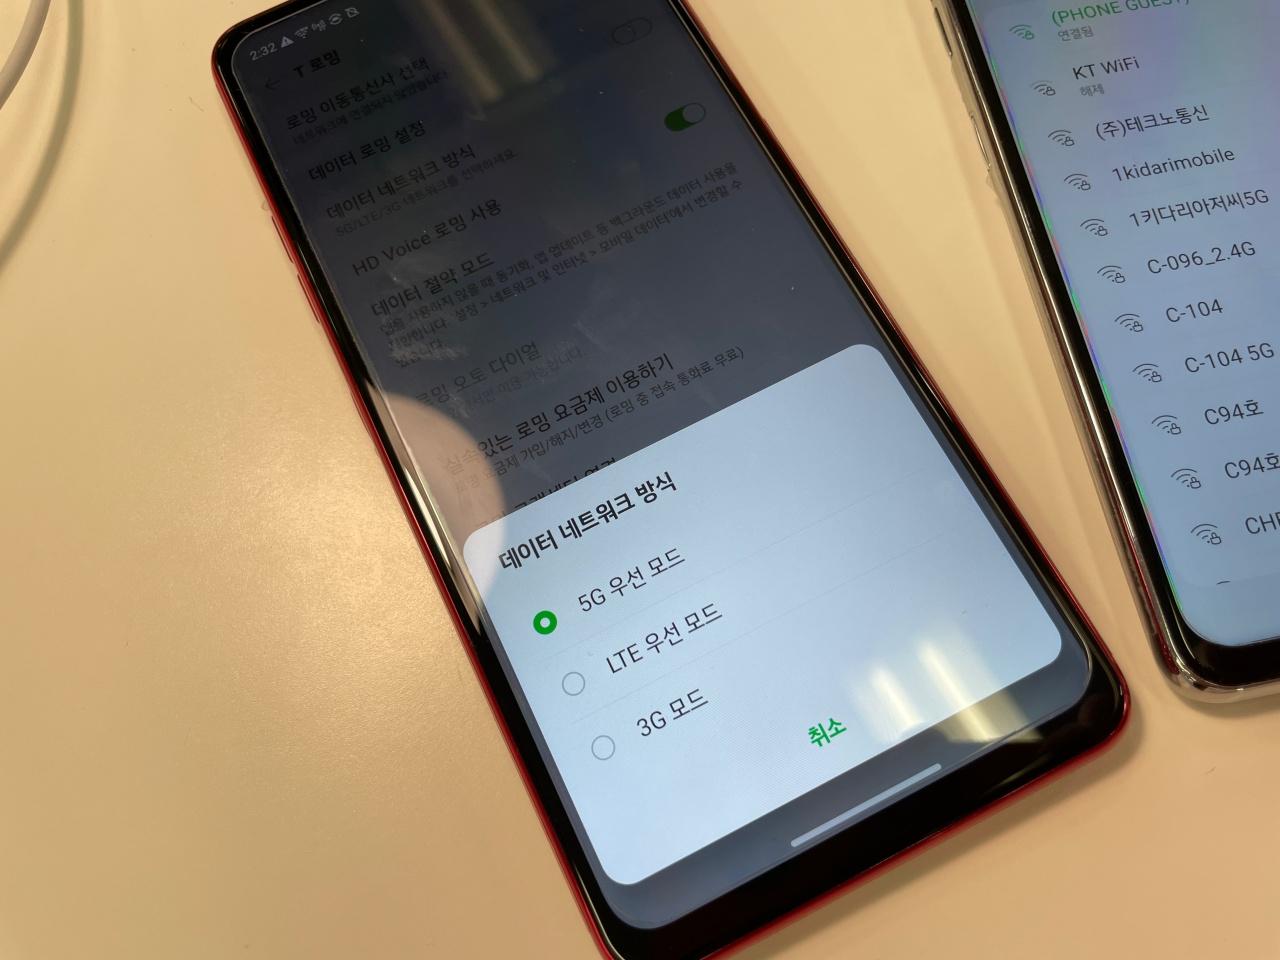 LG-Q920 5G